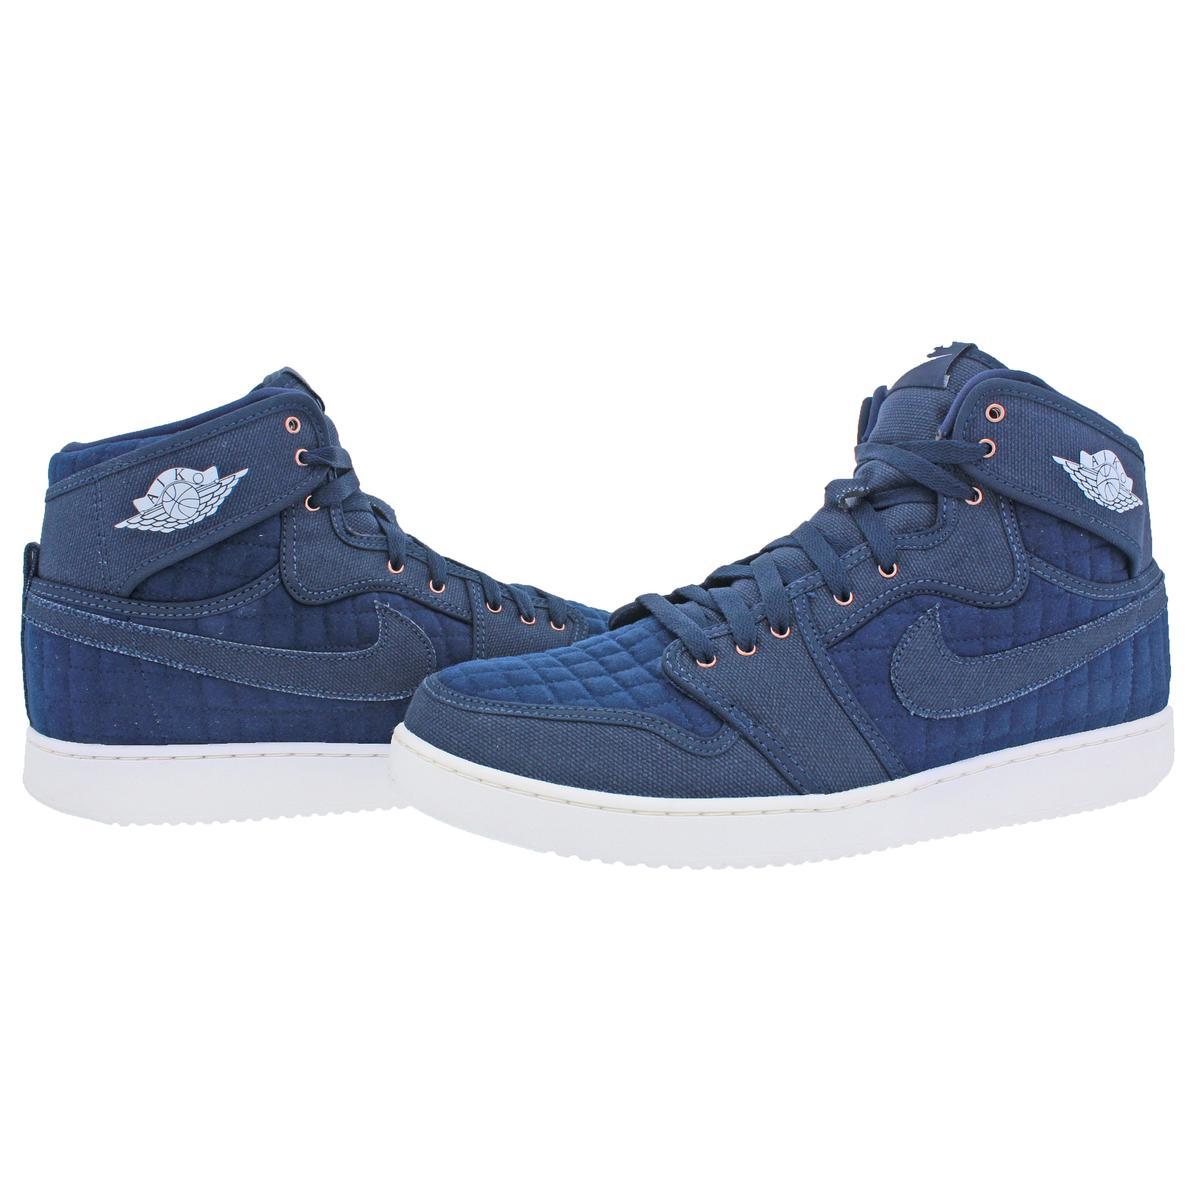 sports shoes 377f8 d771e Nike Air Jordan 1 KO High OG Mens Retro Performance Basketball Shoes